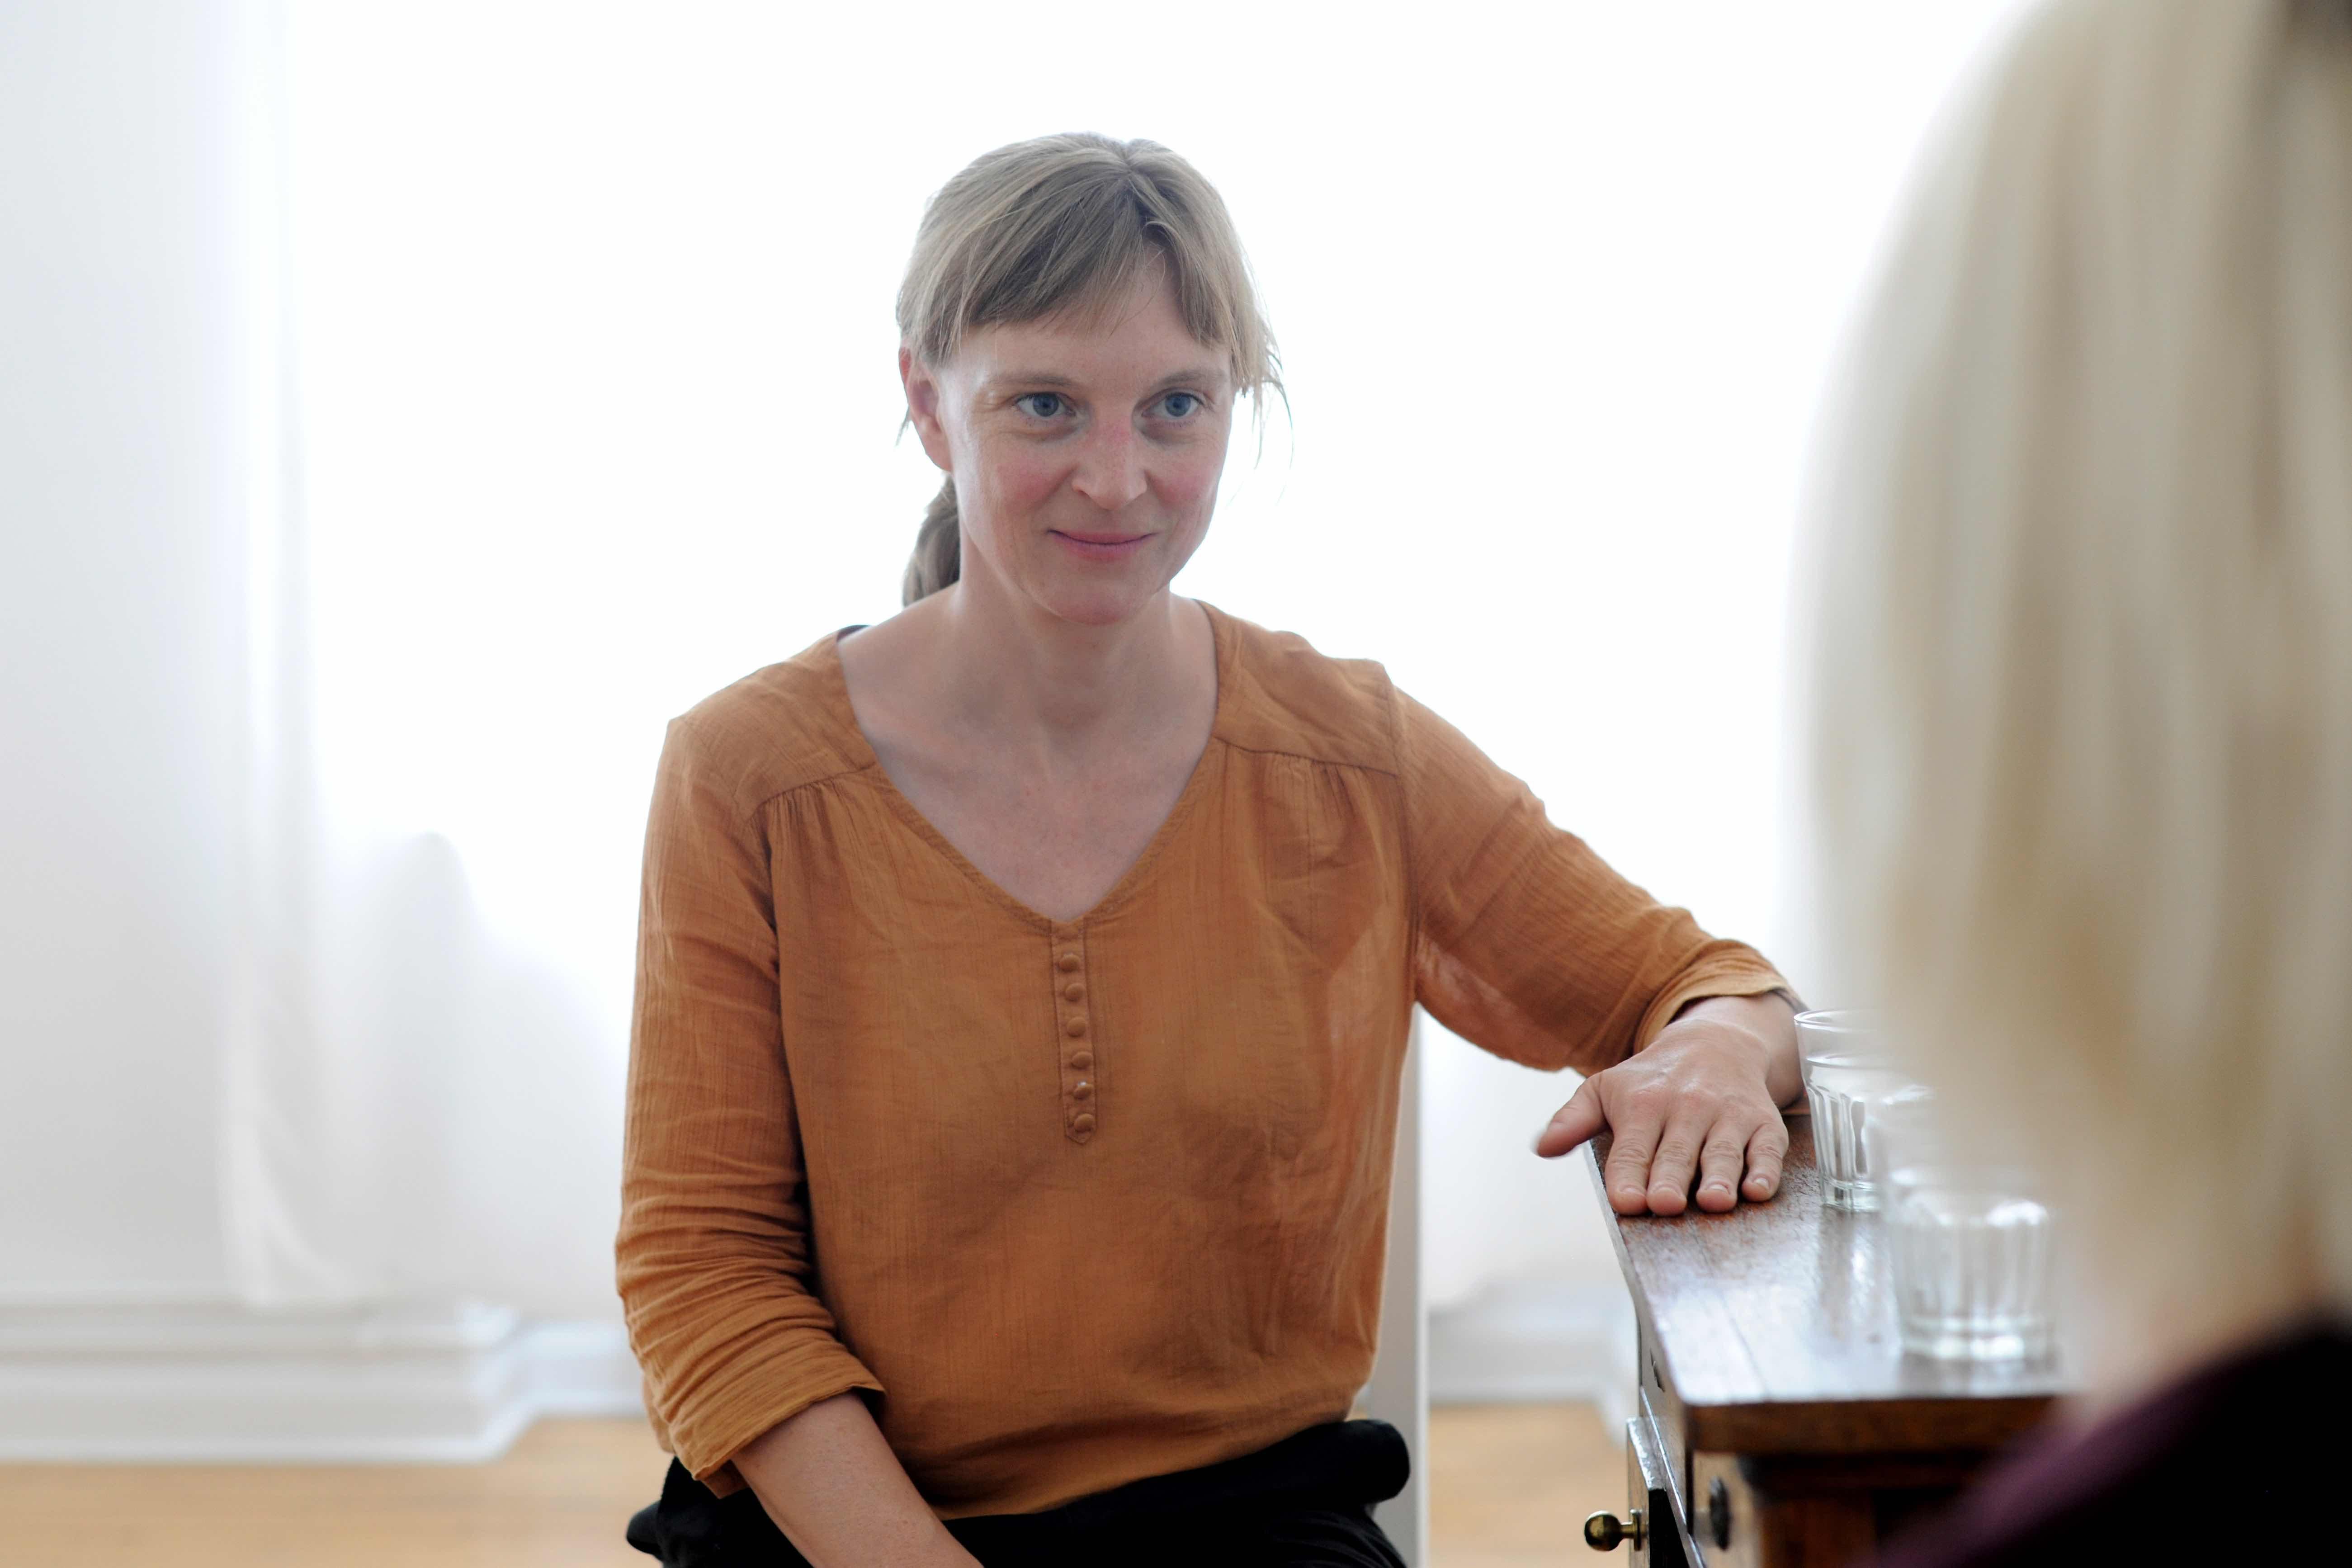 Ganzheitliche Körperarbeit Gespräch Pantarei Approach Berlin